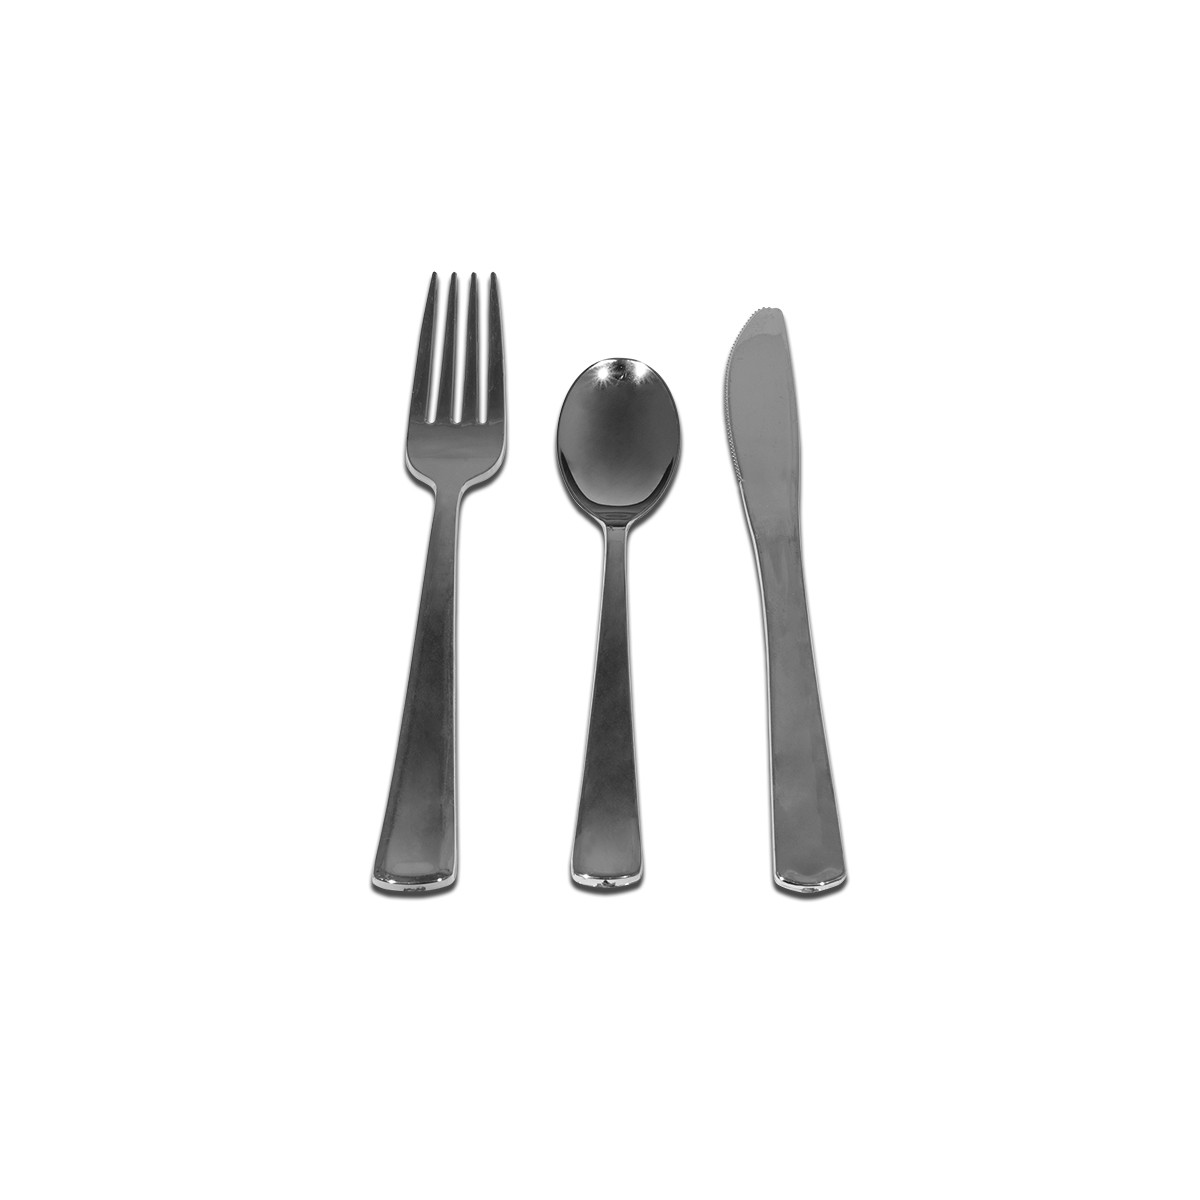 Premium Cutlery Set (Spoon+Fork+Knife) - Silver   18pcsx10pkts